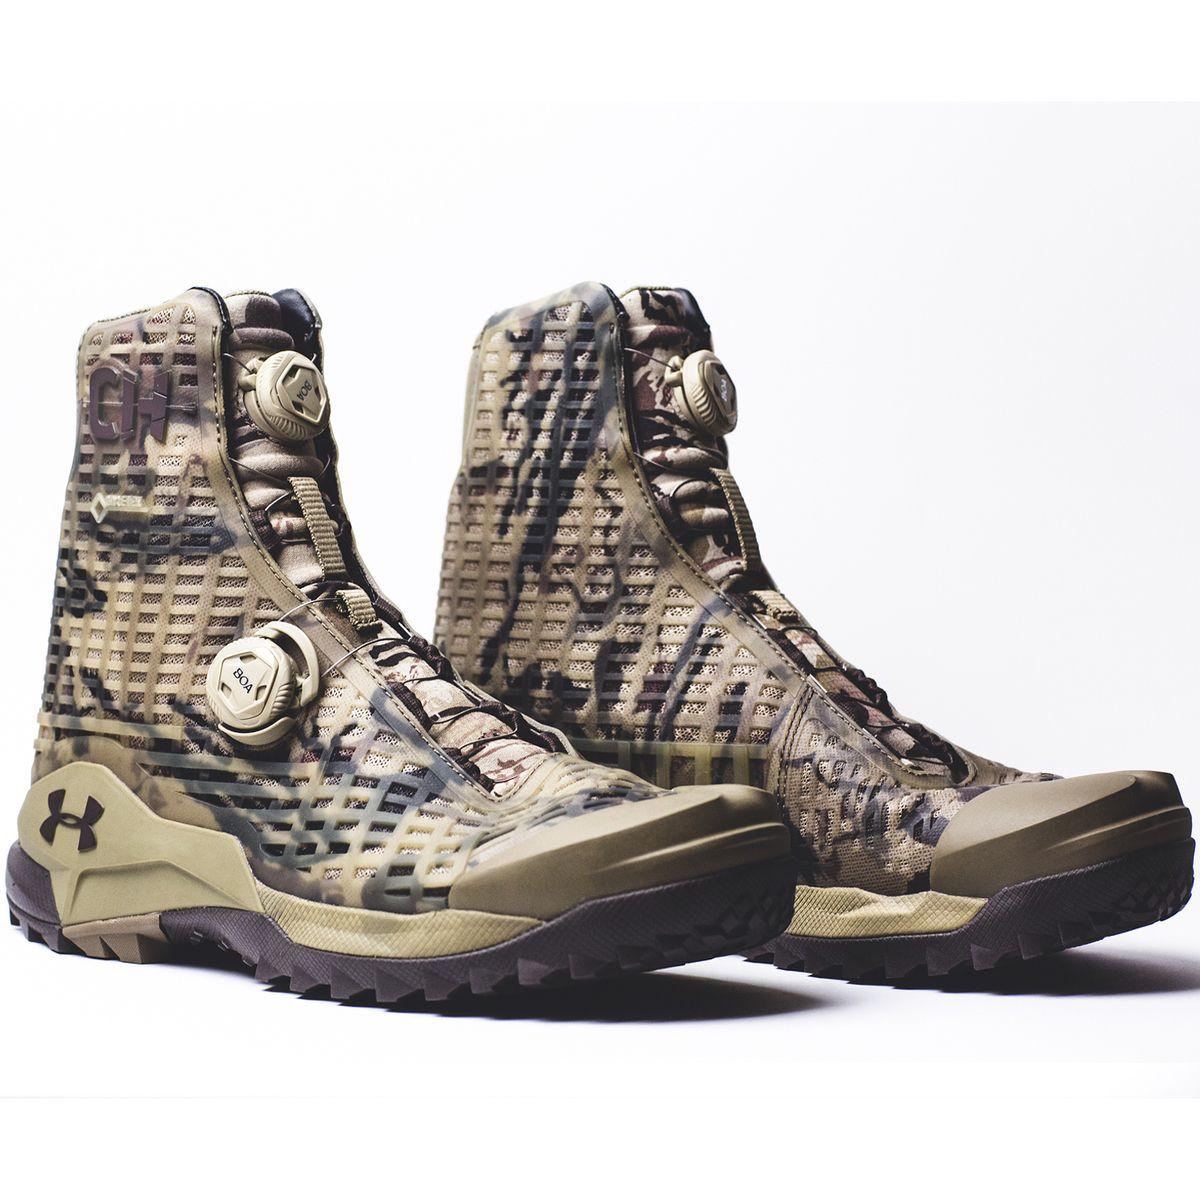 Under Armour Men's Cam Hanes CH1 GORETEX Waterproof